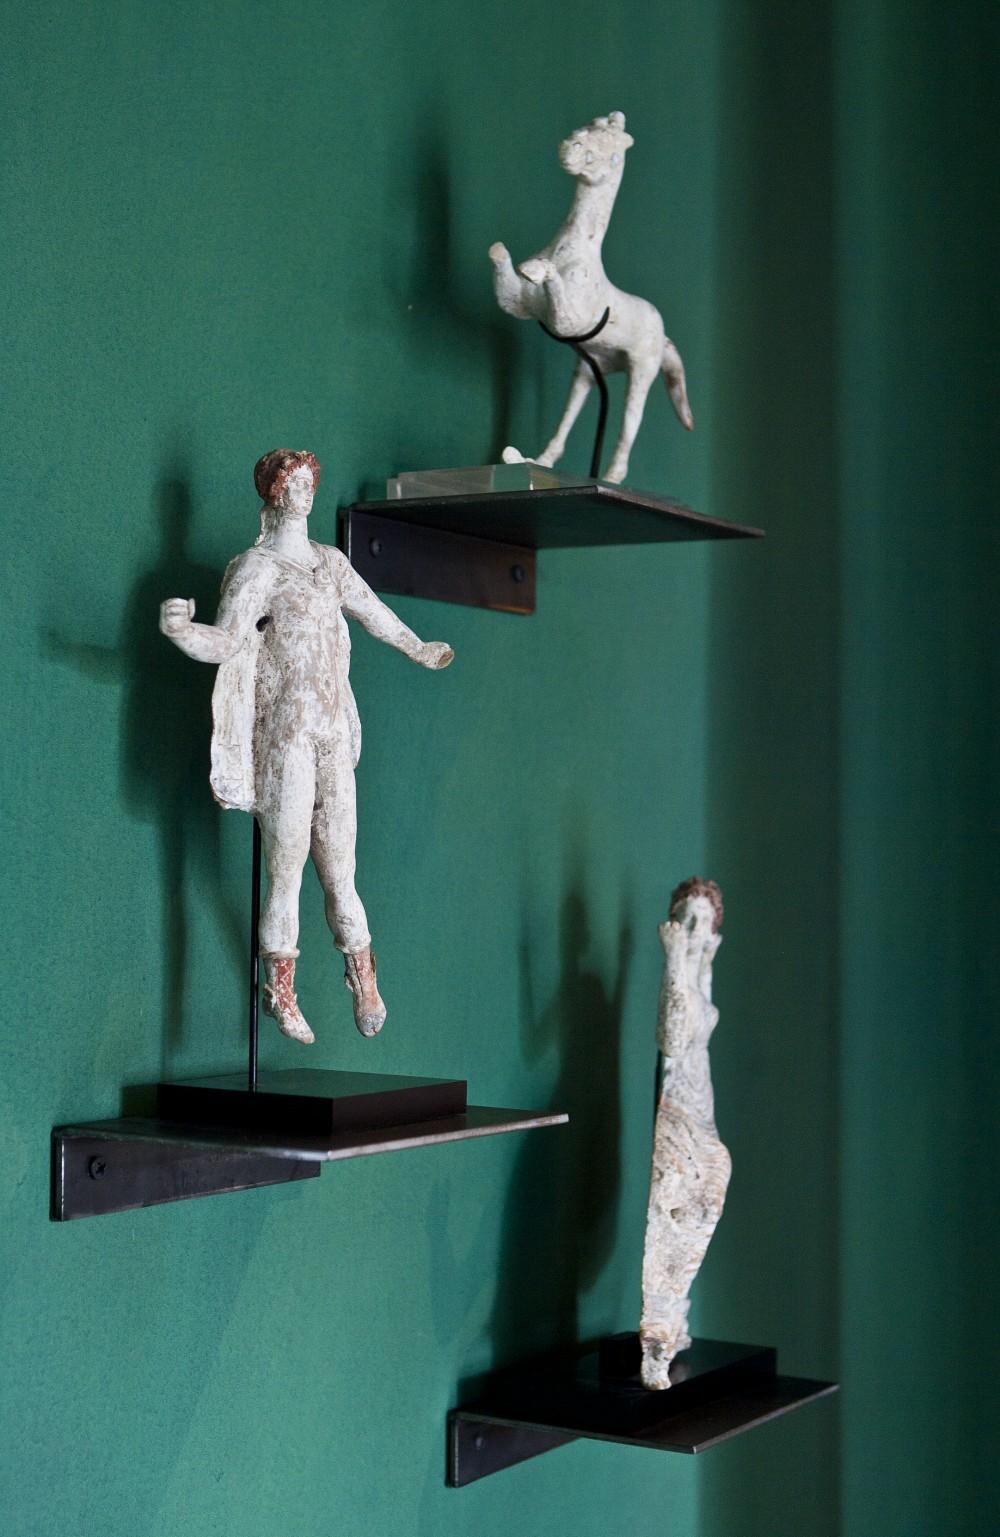 Antike Skulpturen an der Wand des Esszimmers